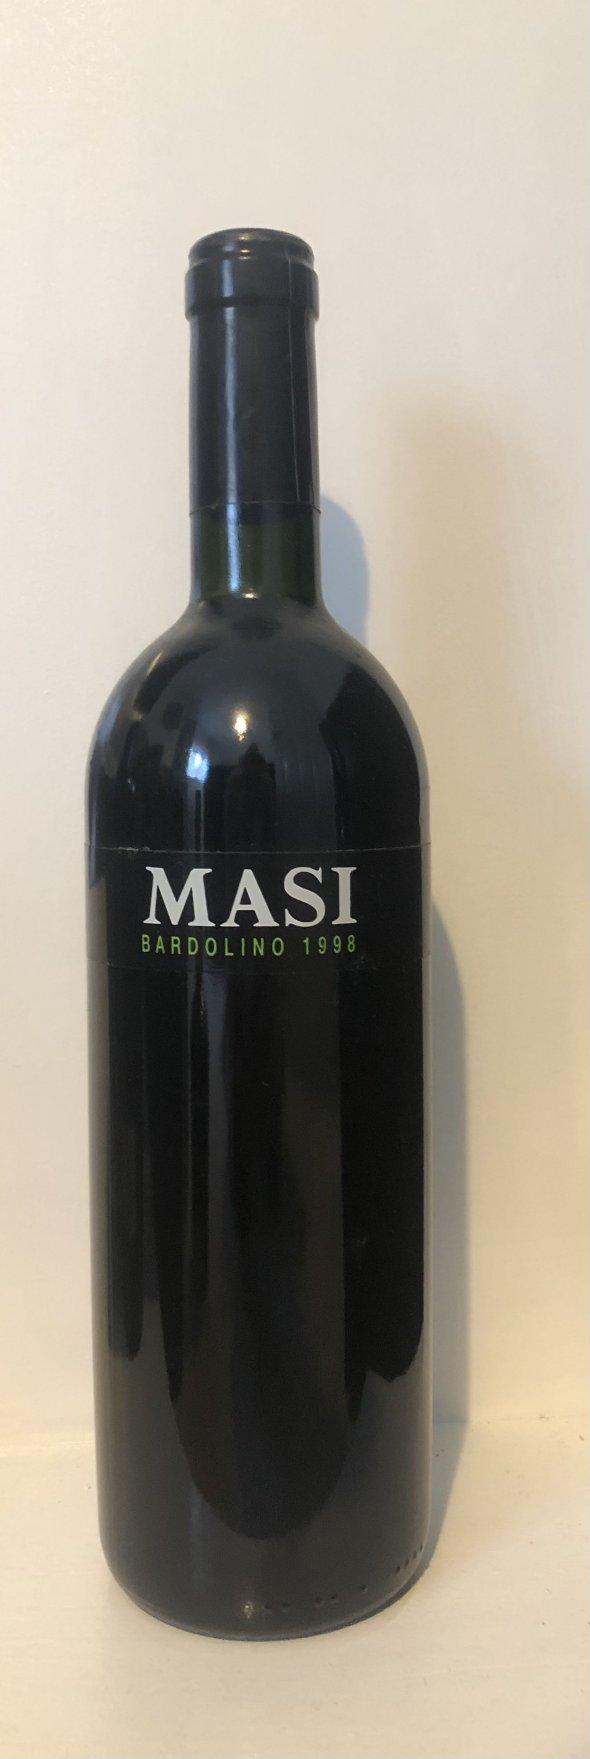 Masi, Bardolino, Classico superiore